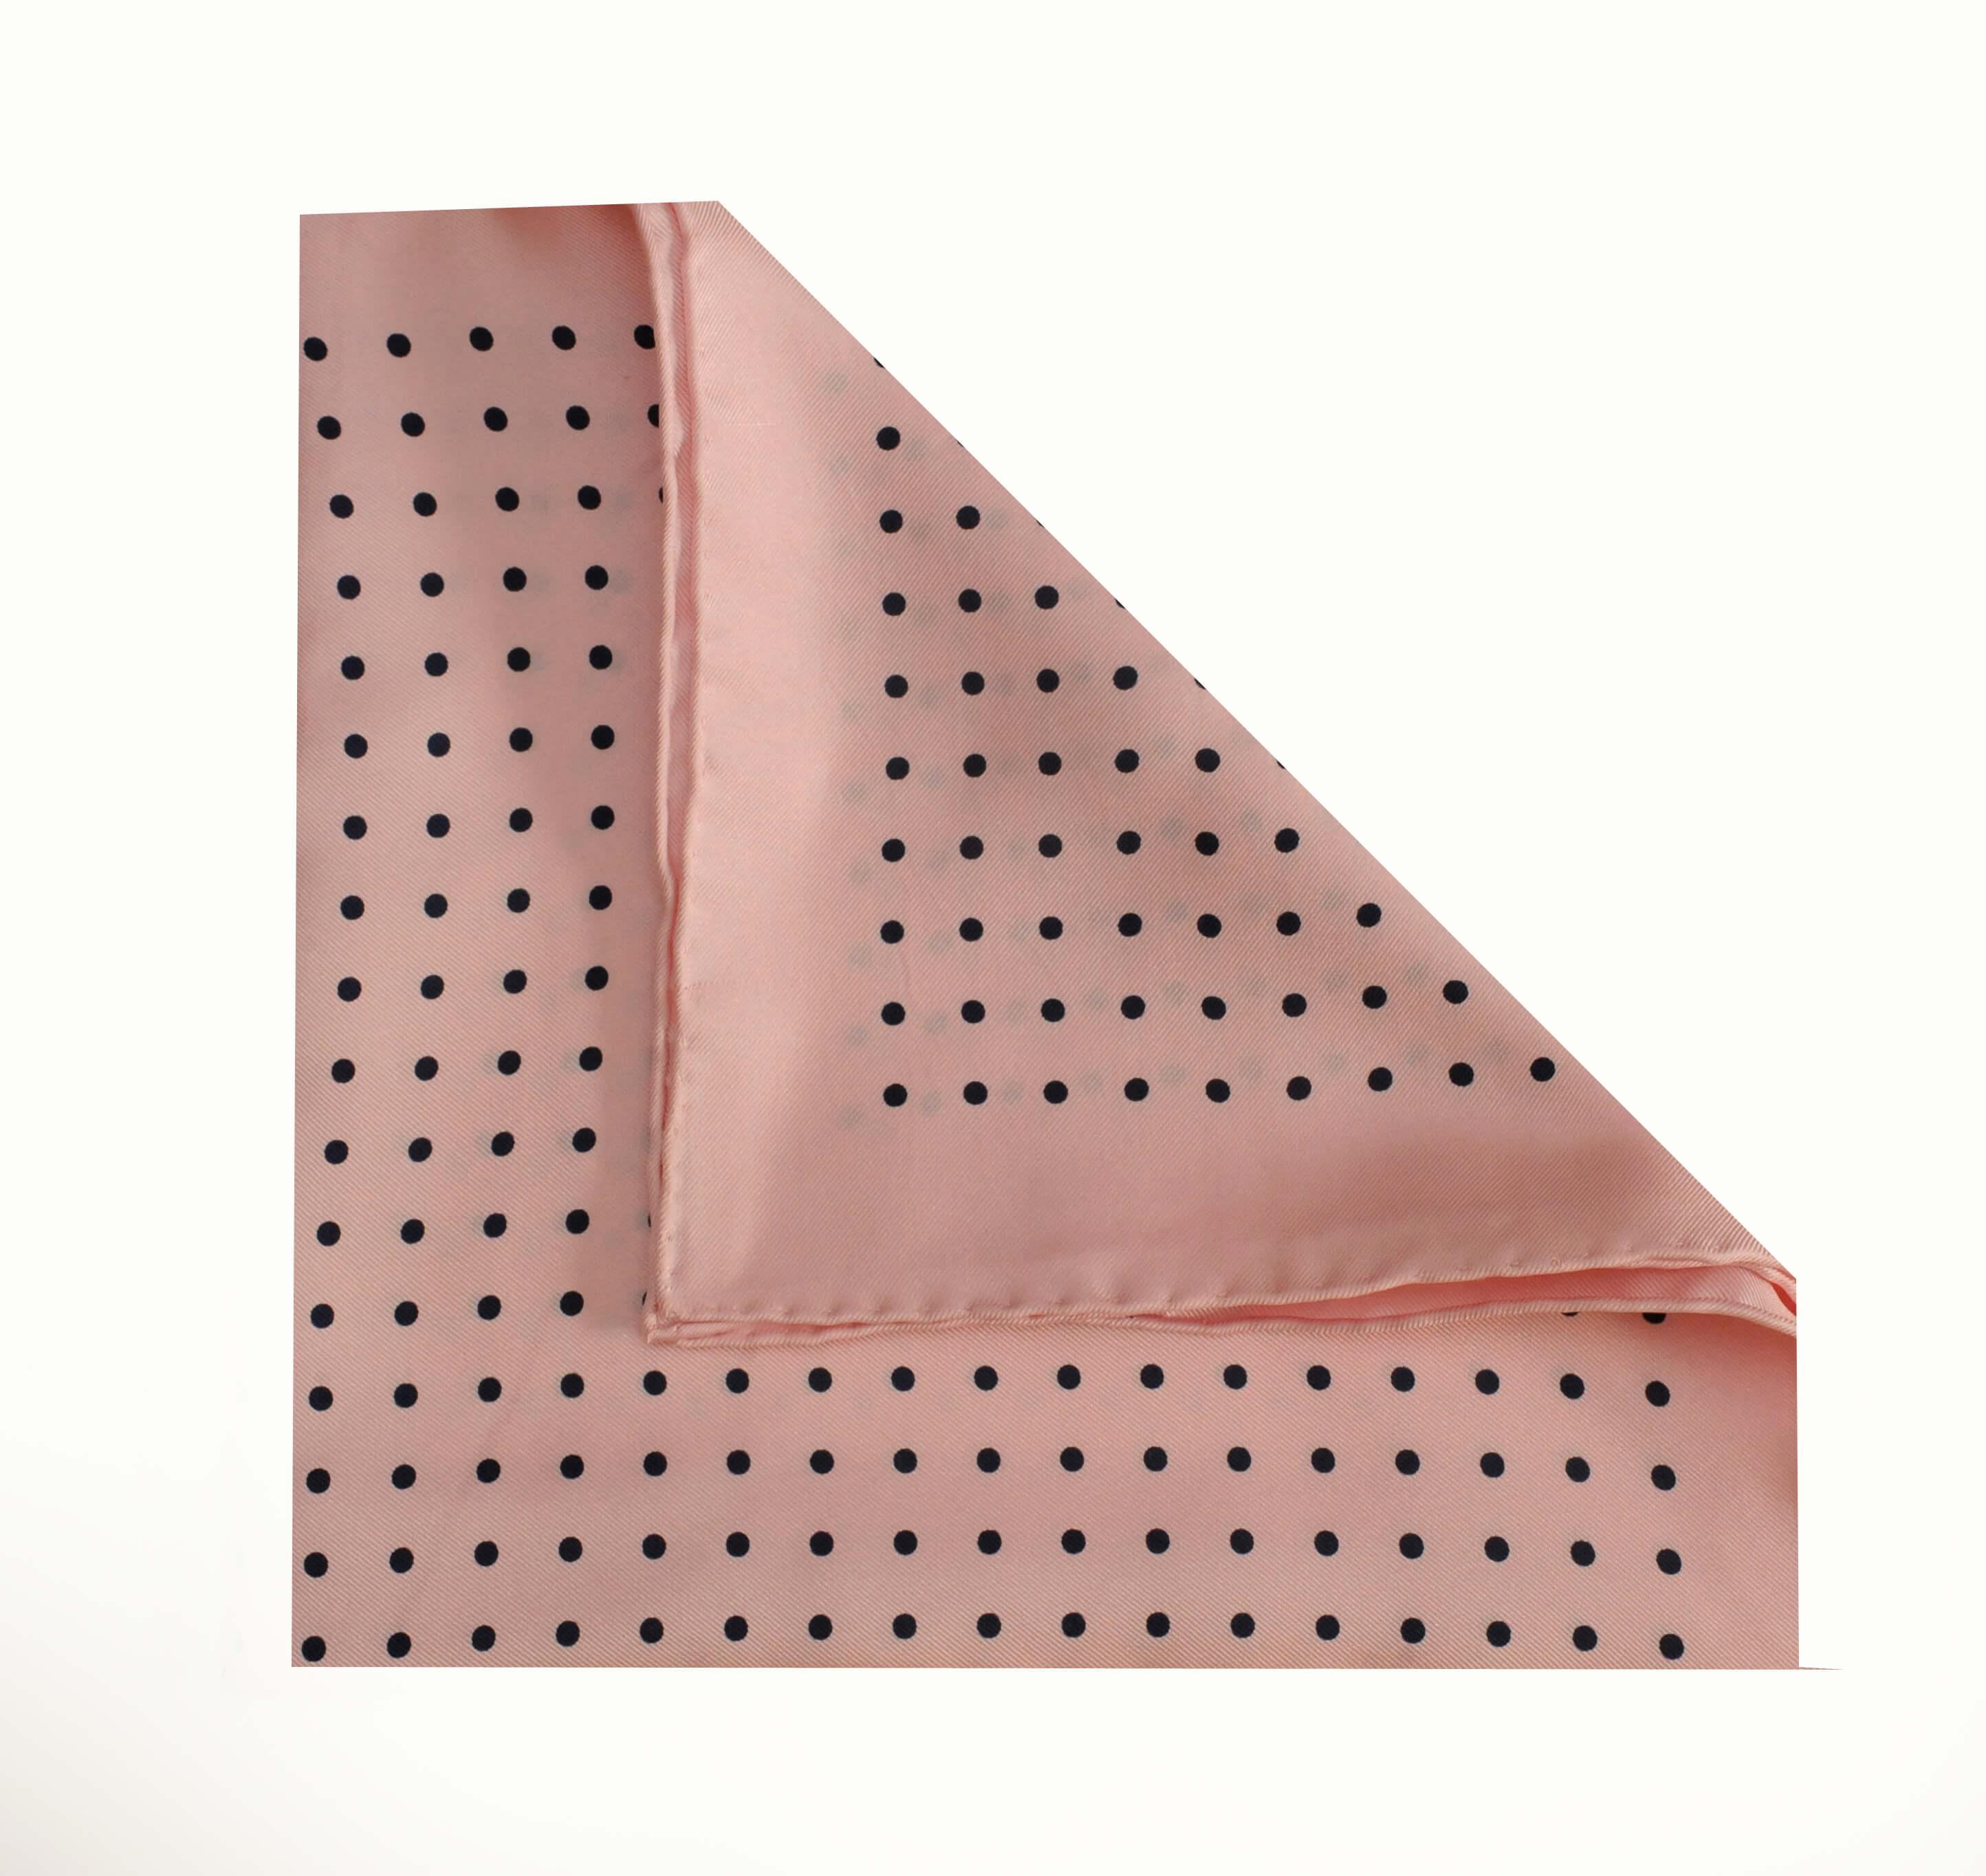 Jack - Polka Dot Silk Pocket Square in Pink with Black Spots